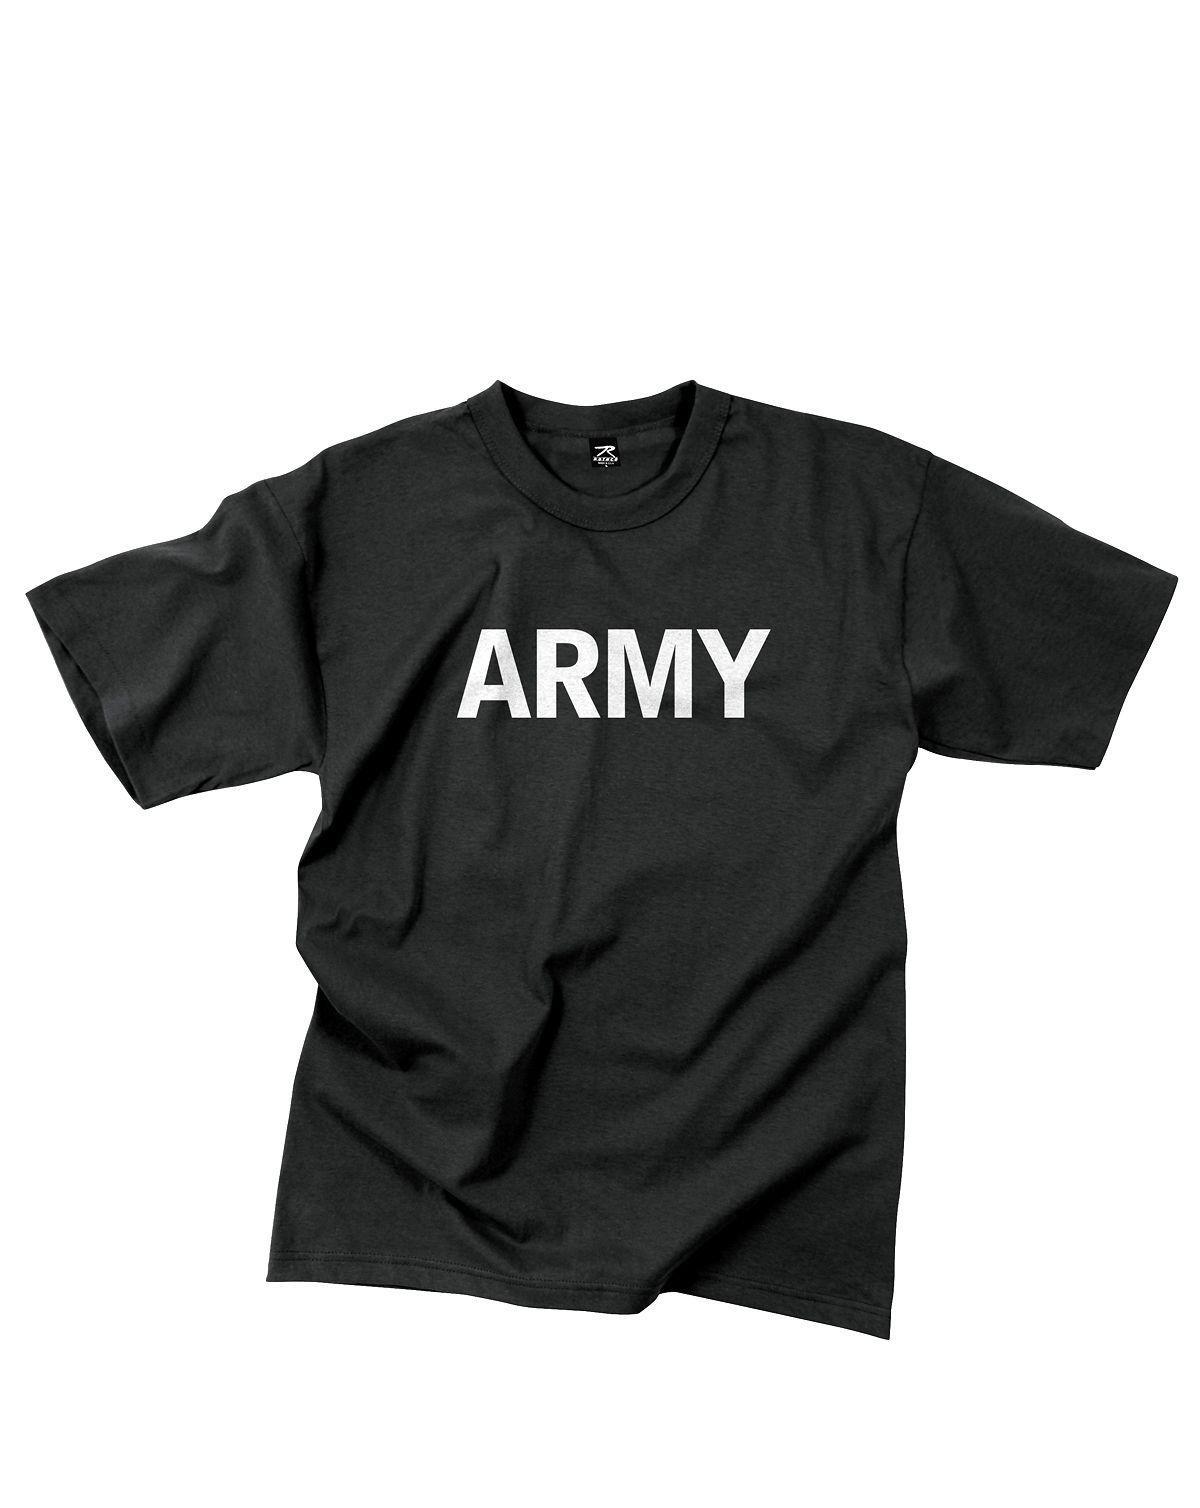 Rothco T-shirt m. PT reflextryck (Svart / ARMY, 3XL)